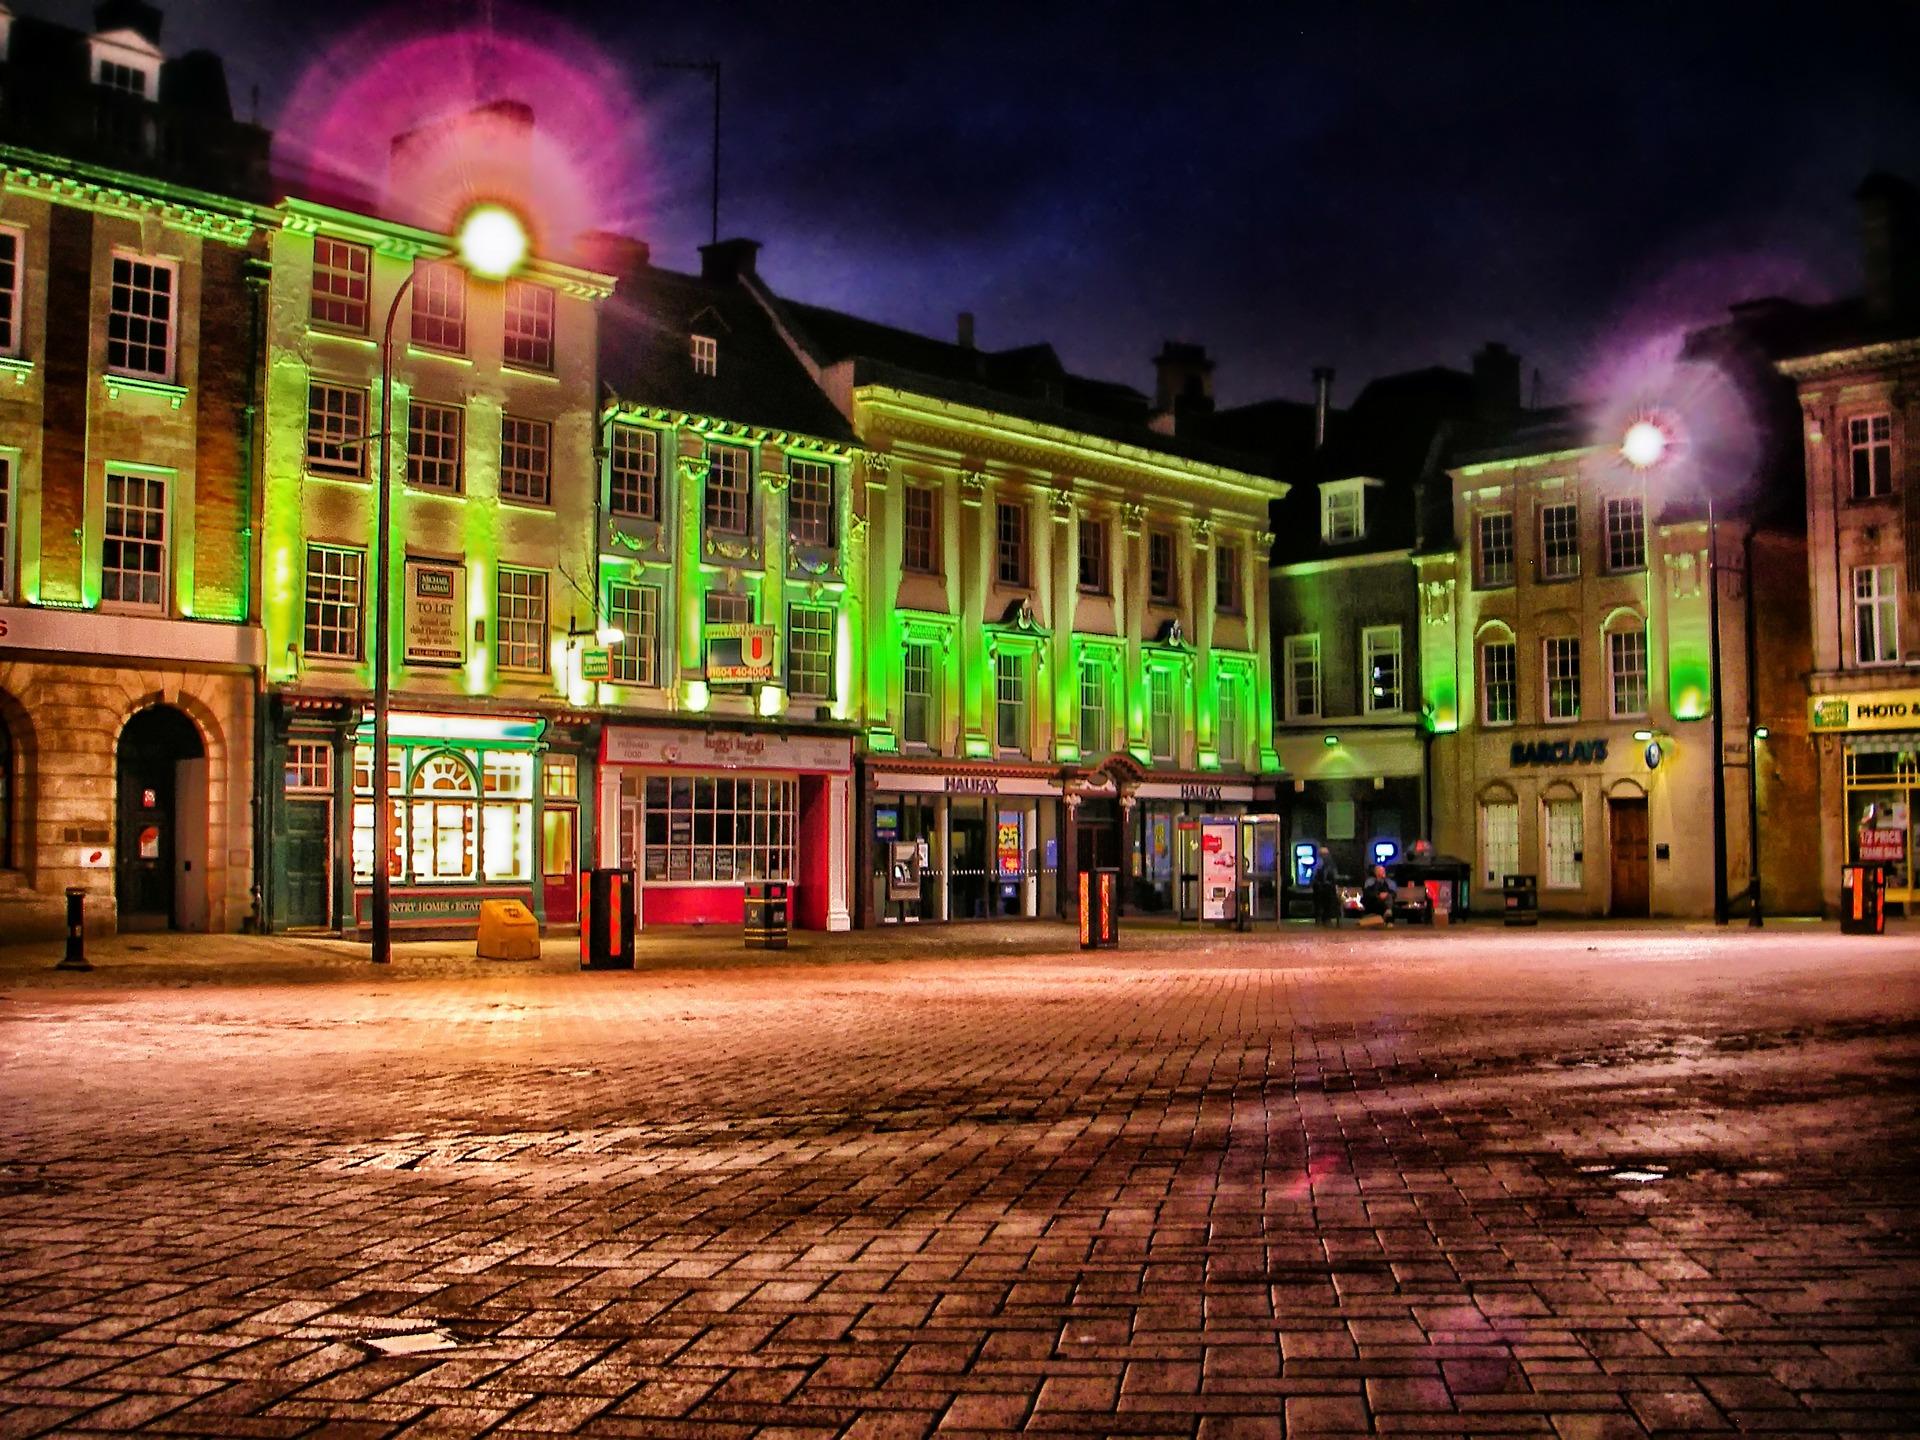 Northampton market square at night